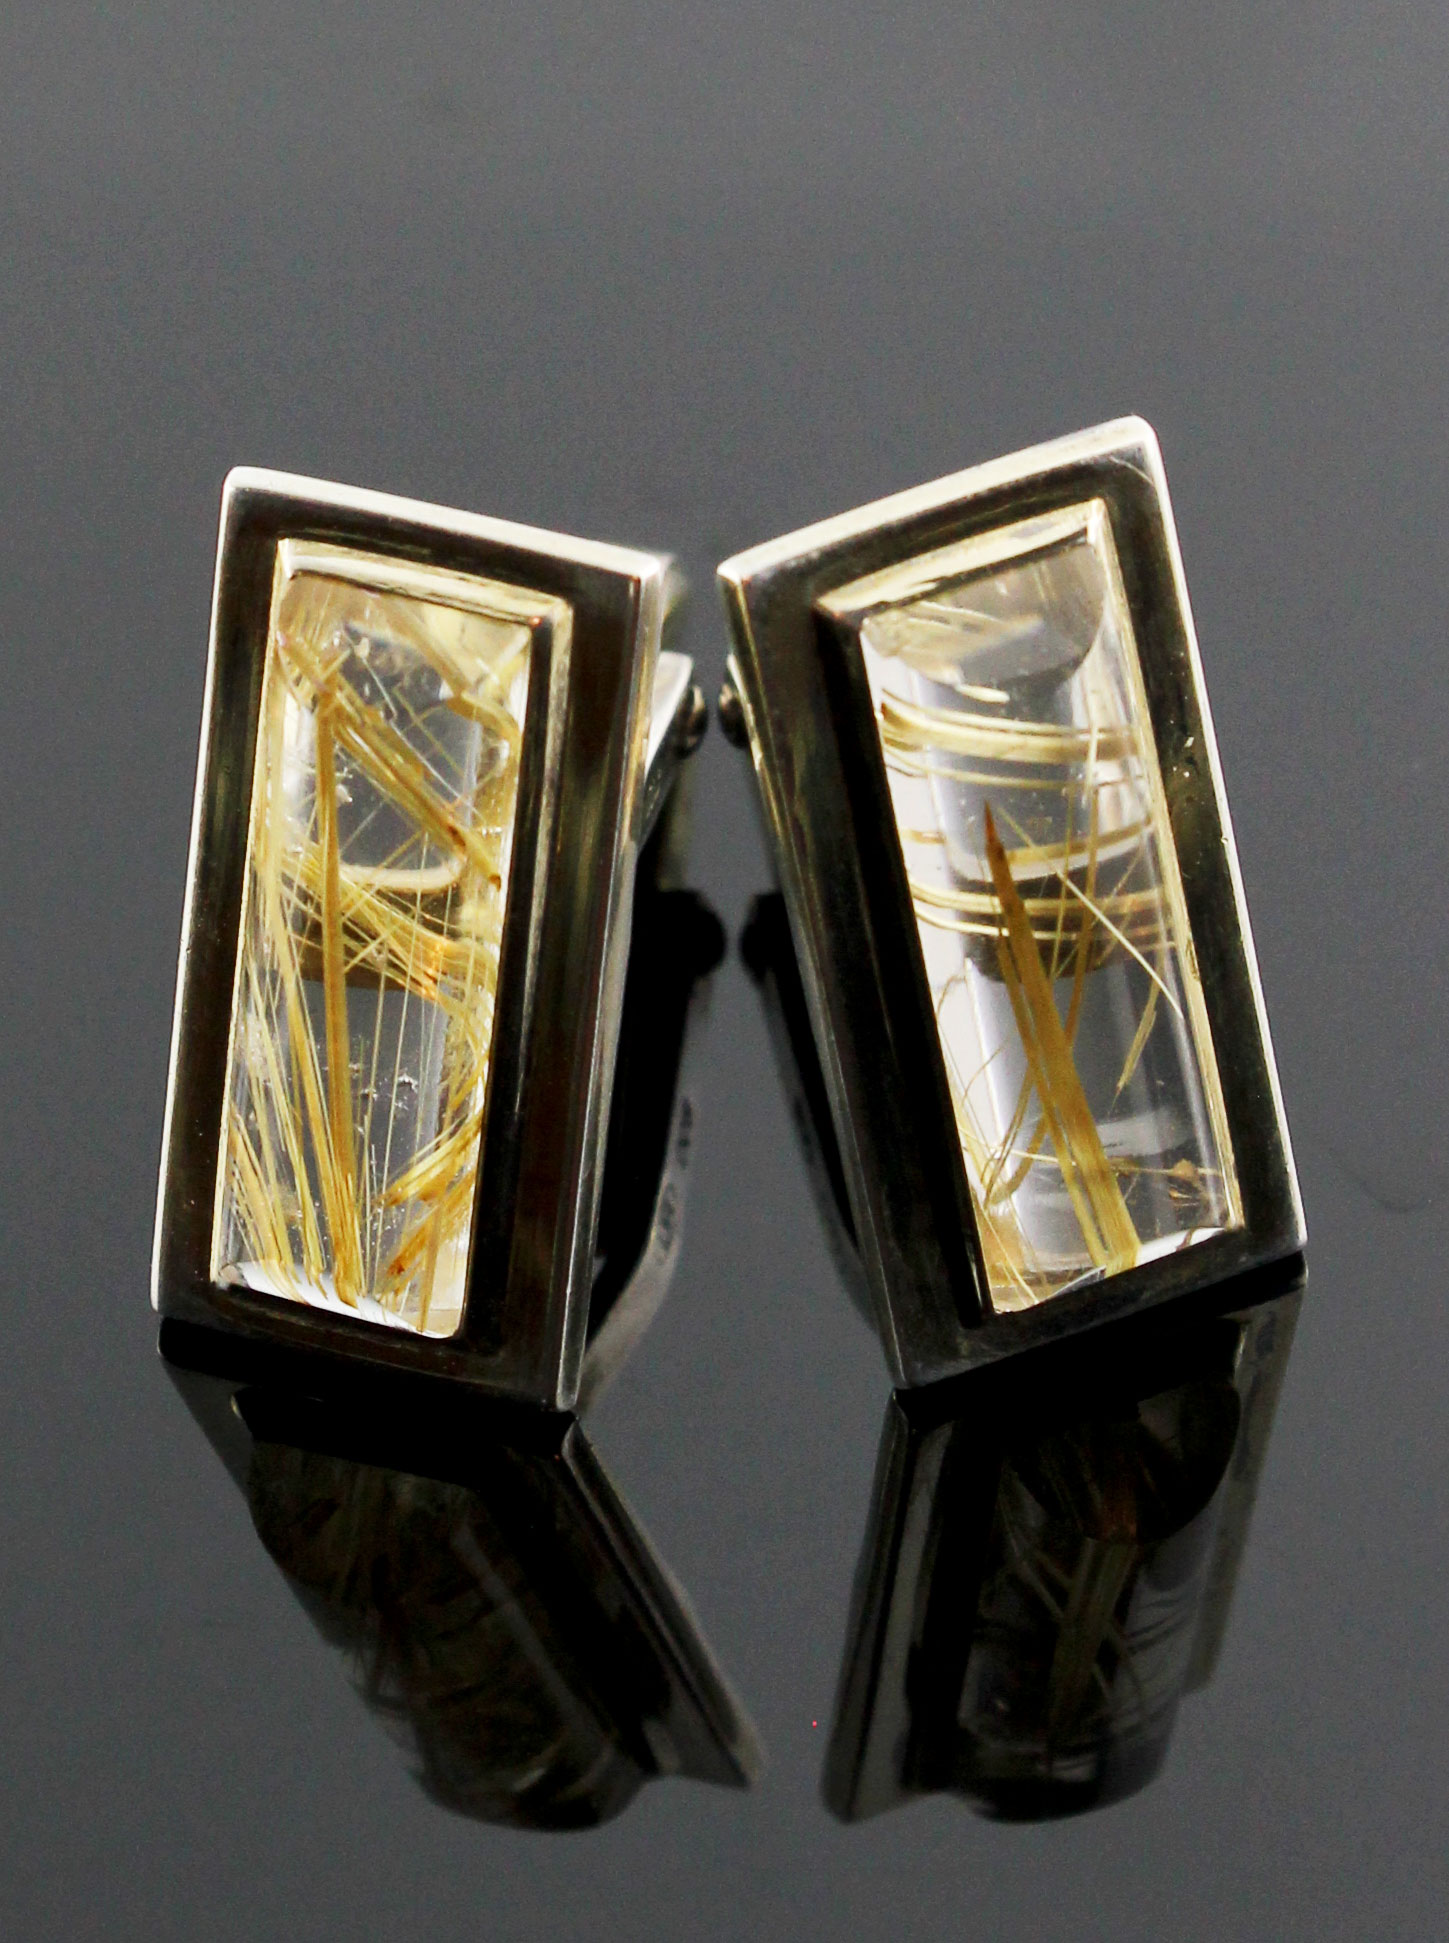 Rare silver cufflinks with rutile quartz